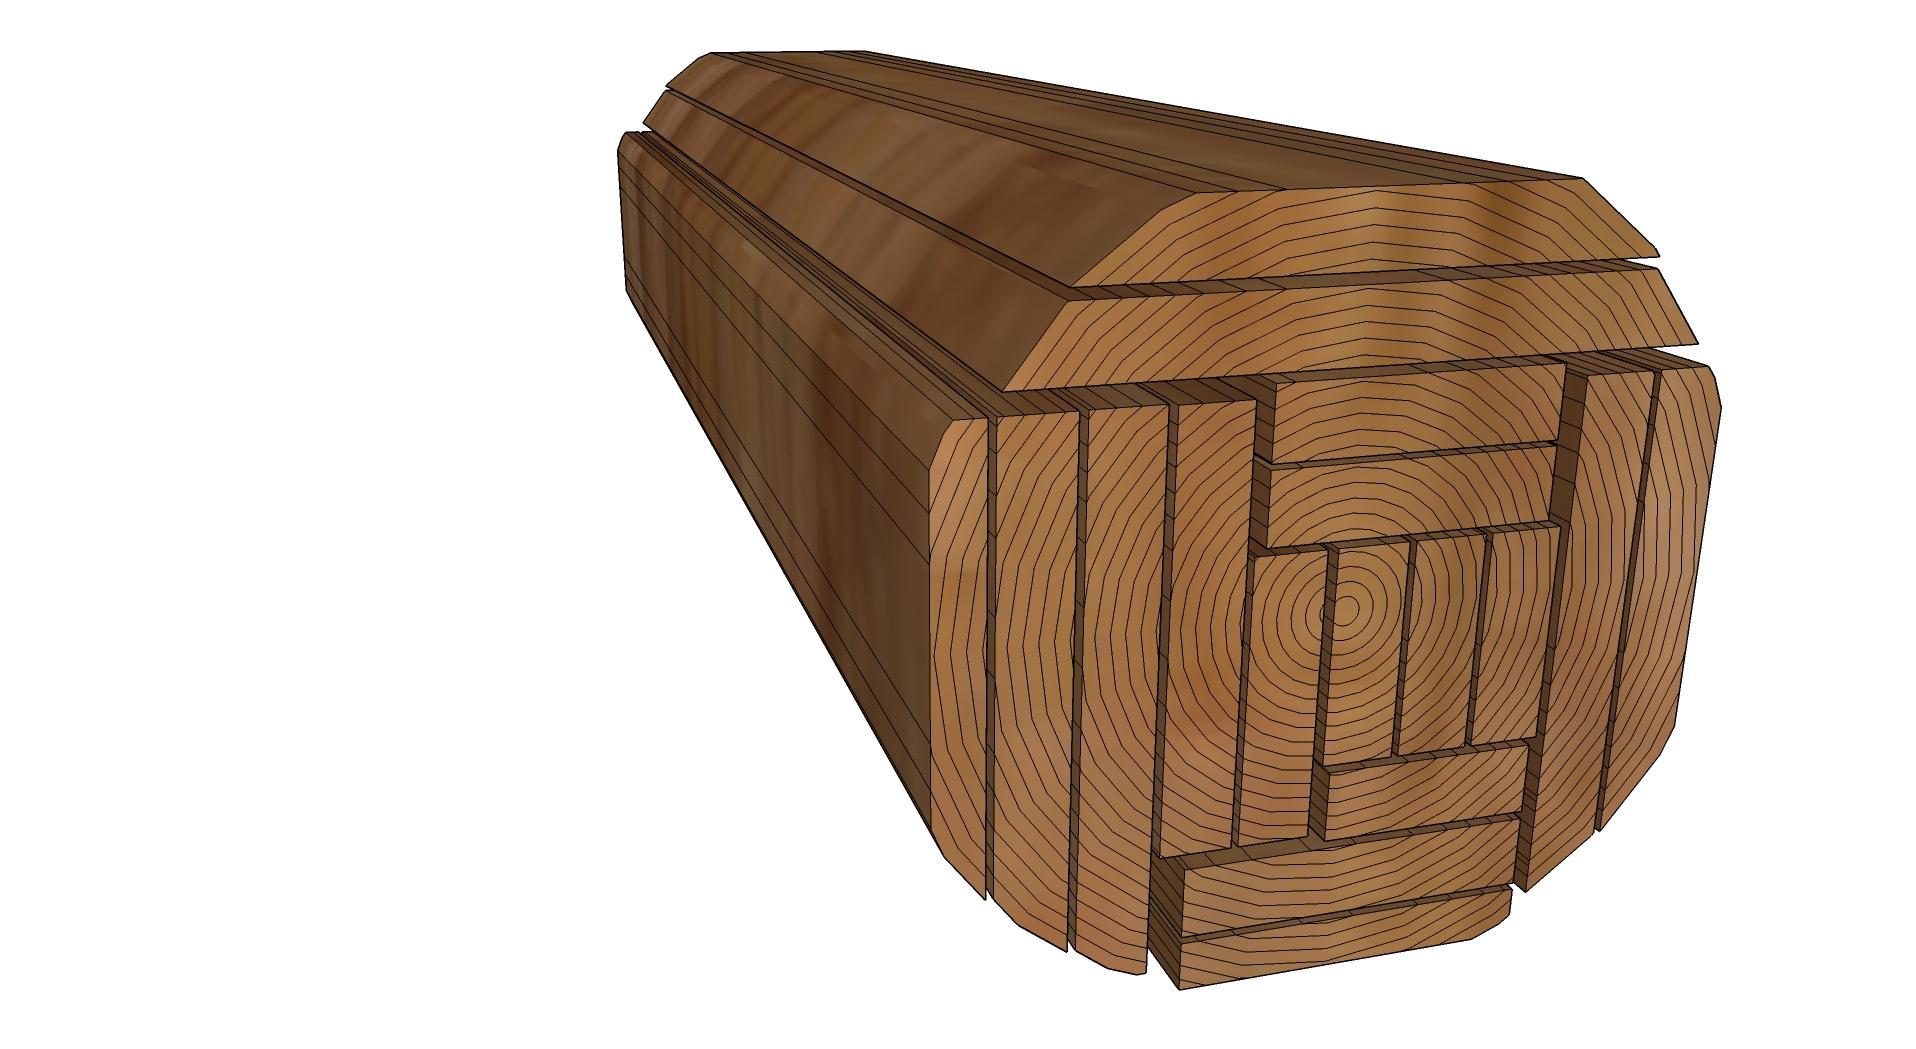 Log sawing patterns to meet customer needs trees money